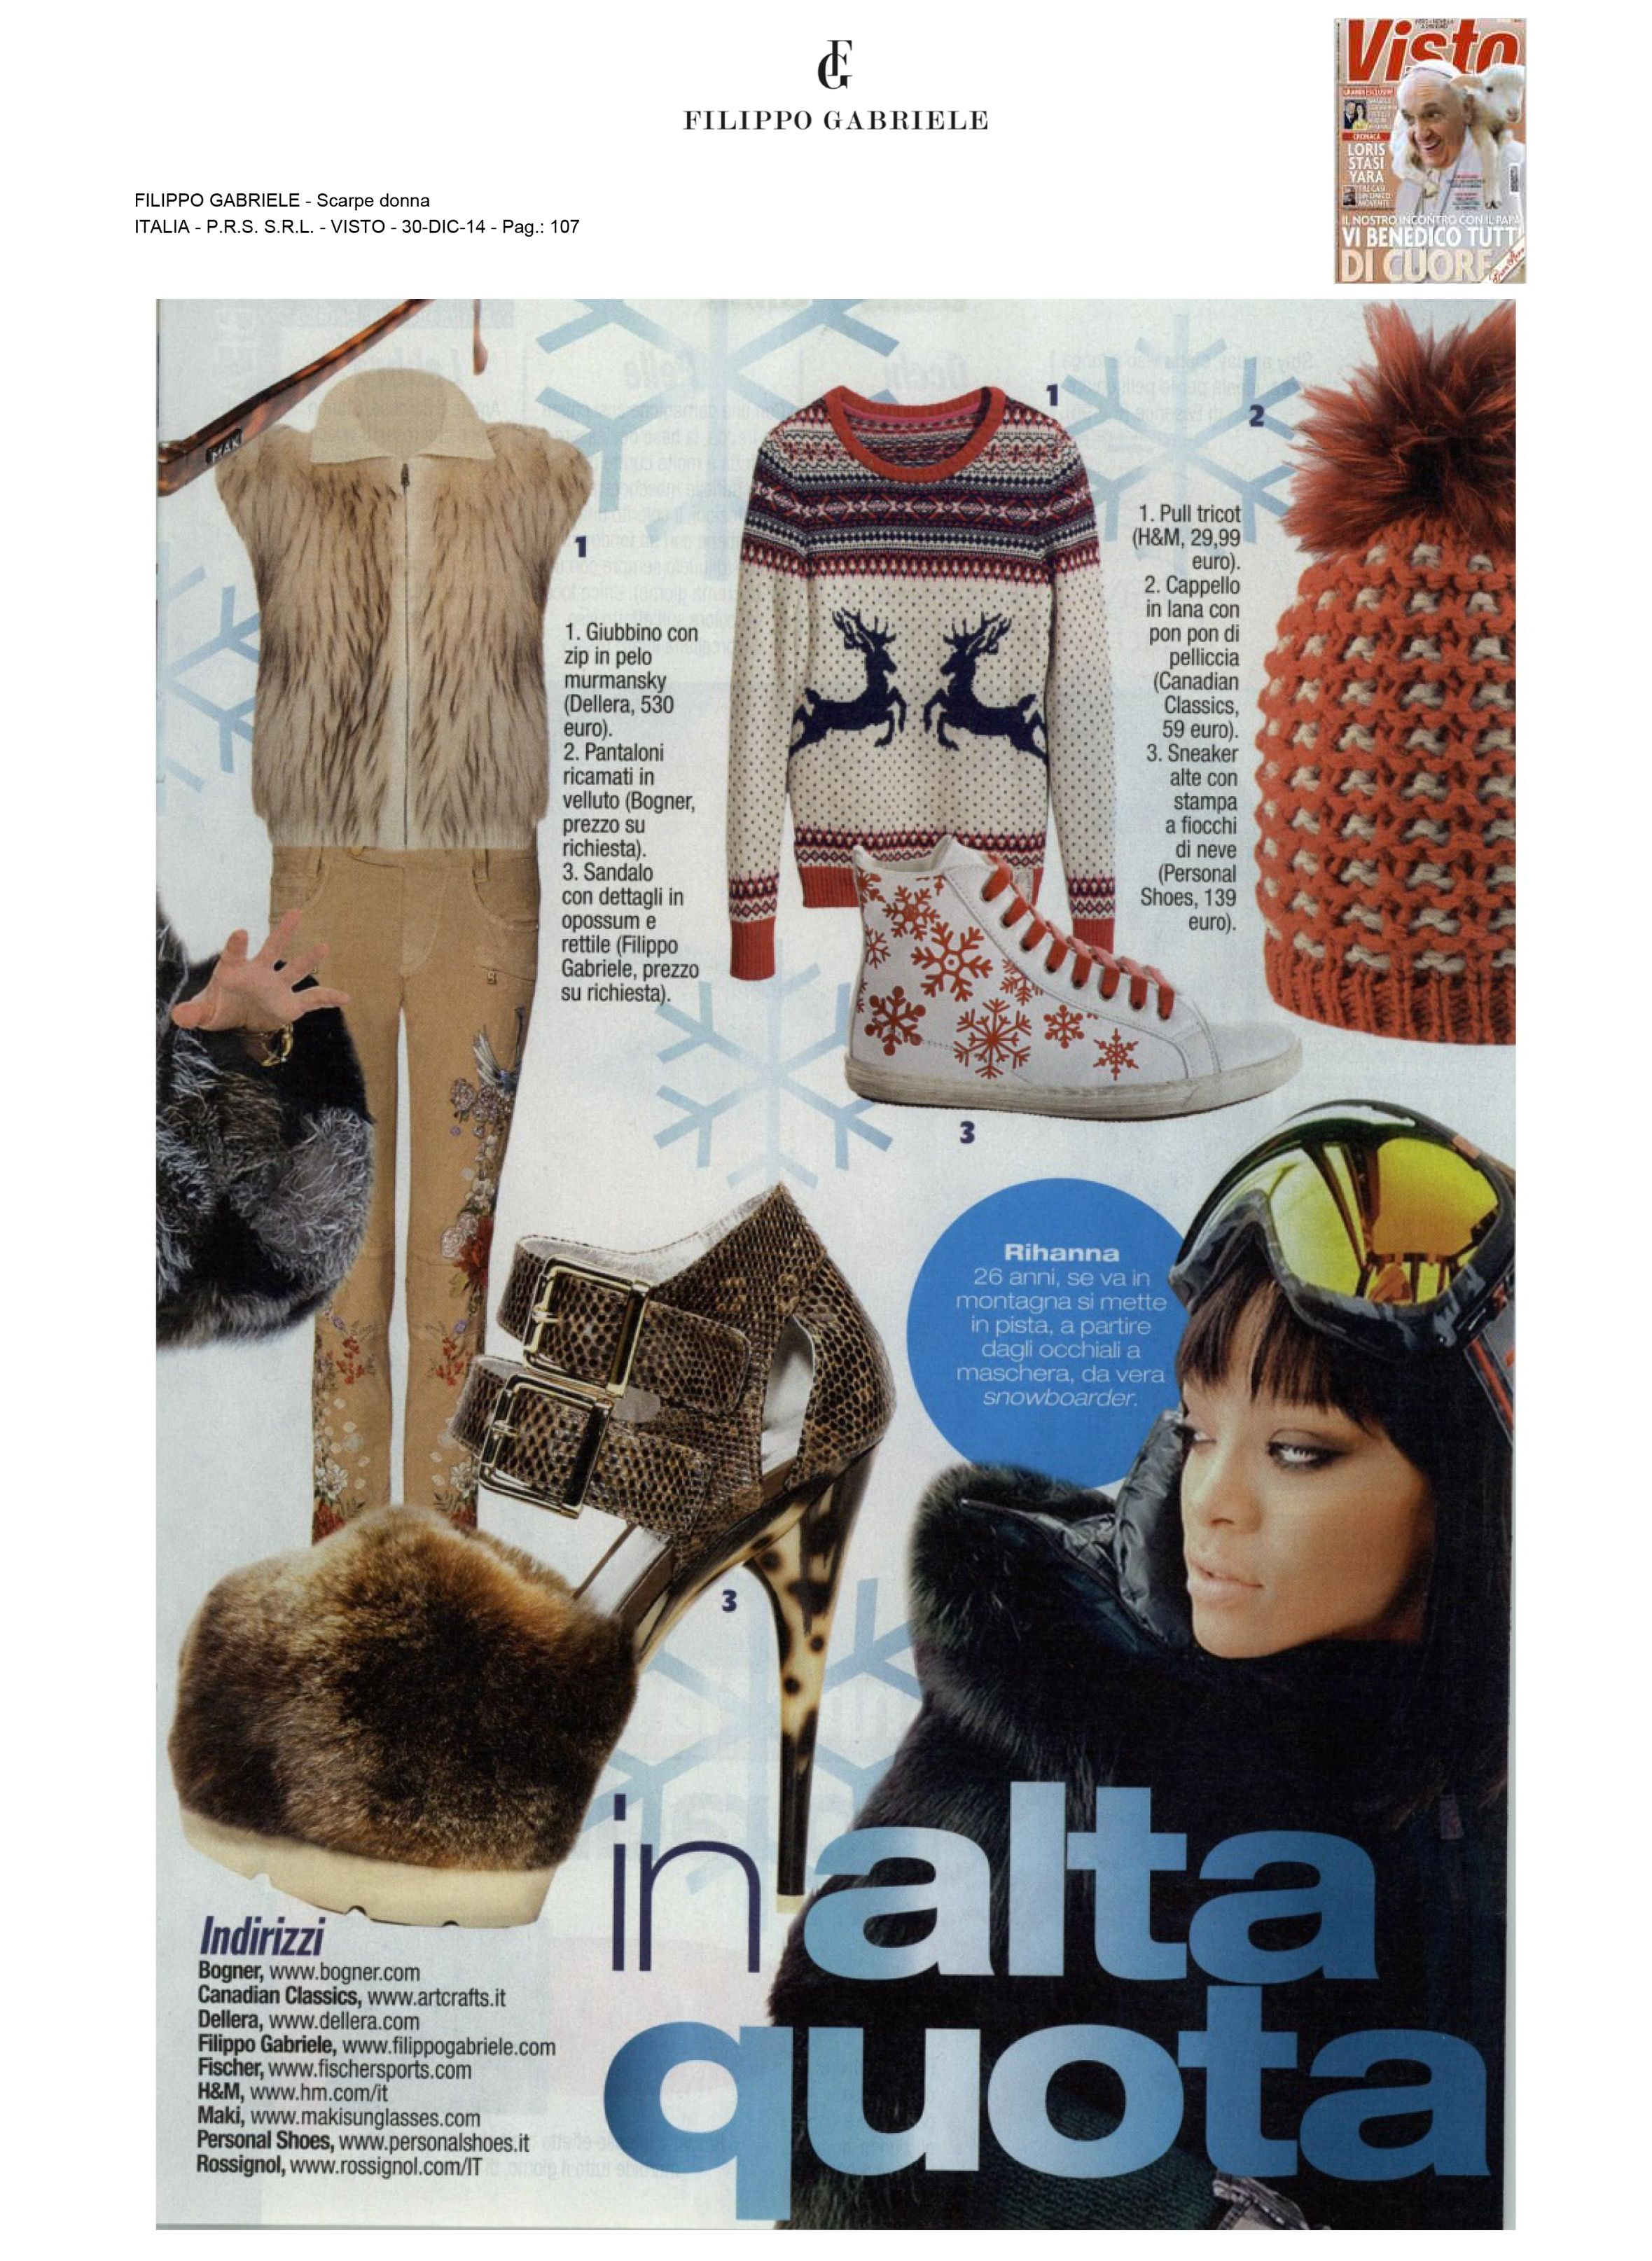 Filippo Gabriele on VISTO #magazine #press #italy